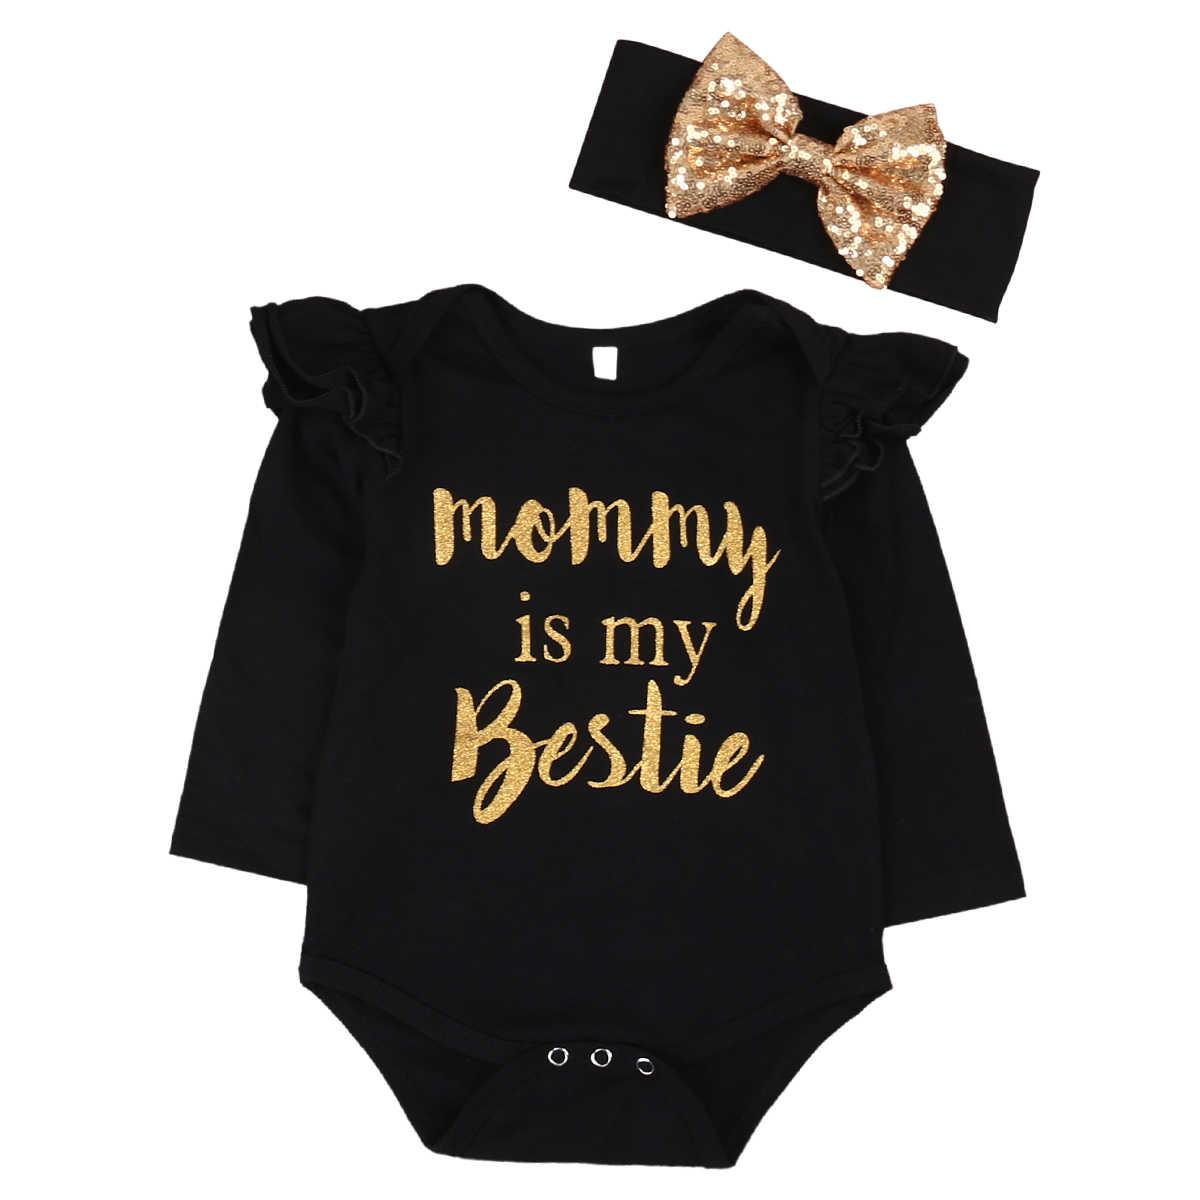 2019 niño bebé Niños Niñas Ropa de mono Braga trajes conjunto diadema 2 piezas tamaño 0-24 M